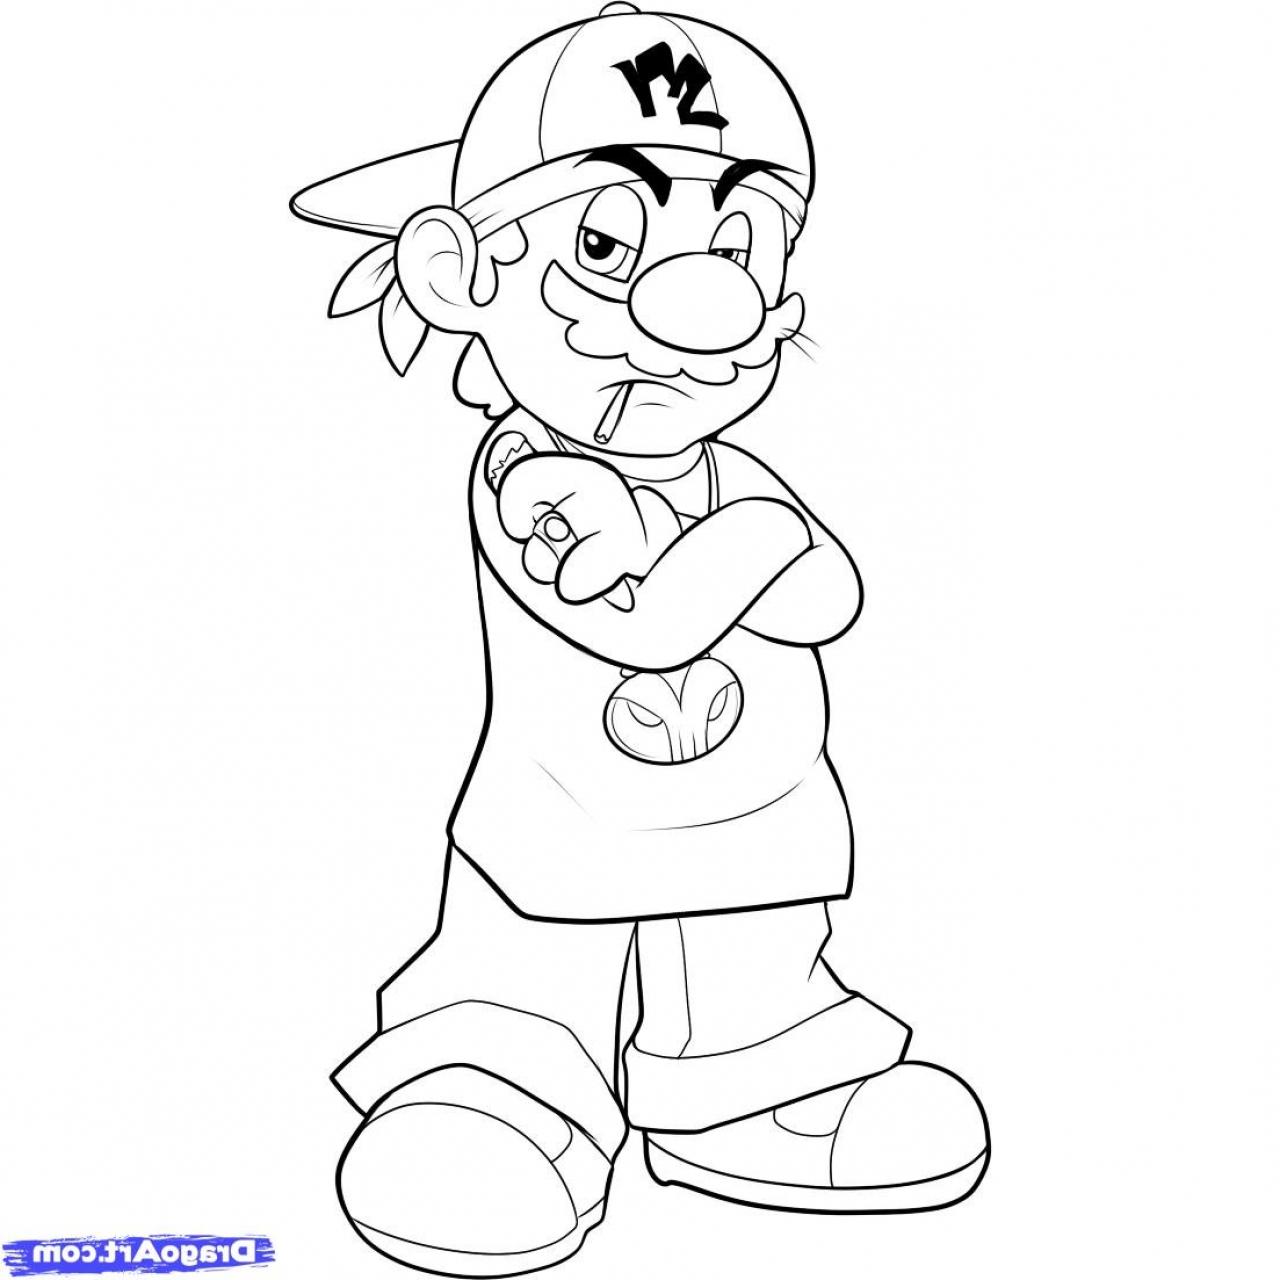 1280x1280 Funny Drawings Of Cartoon People